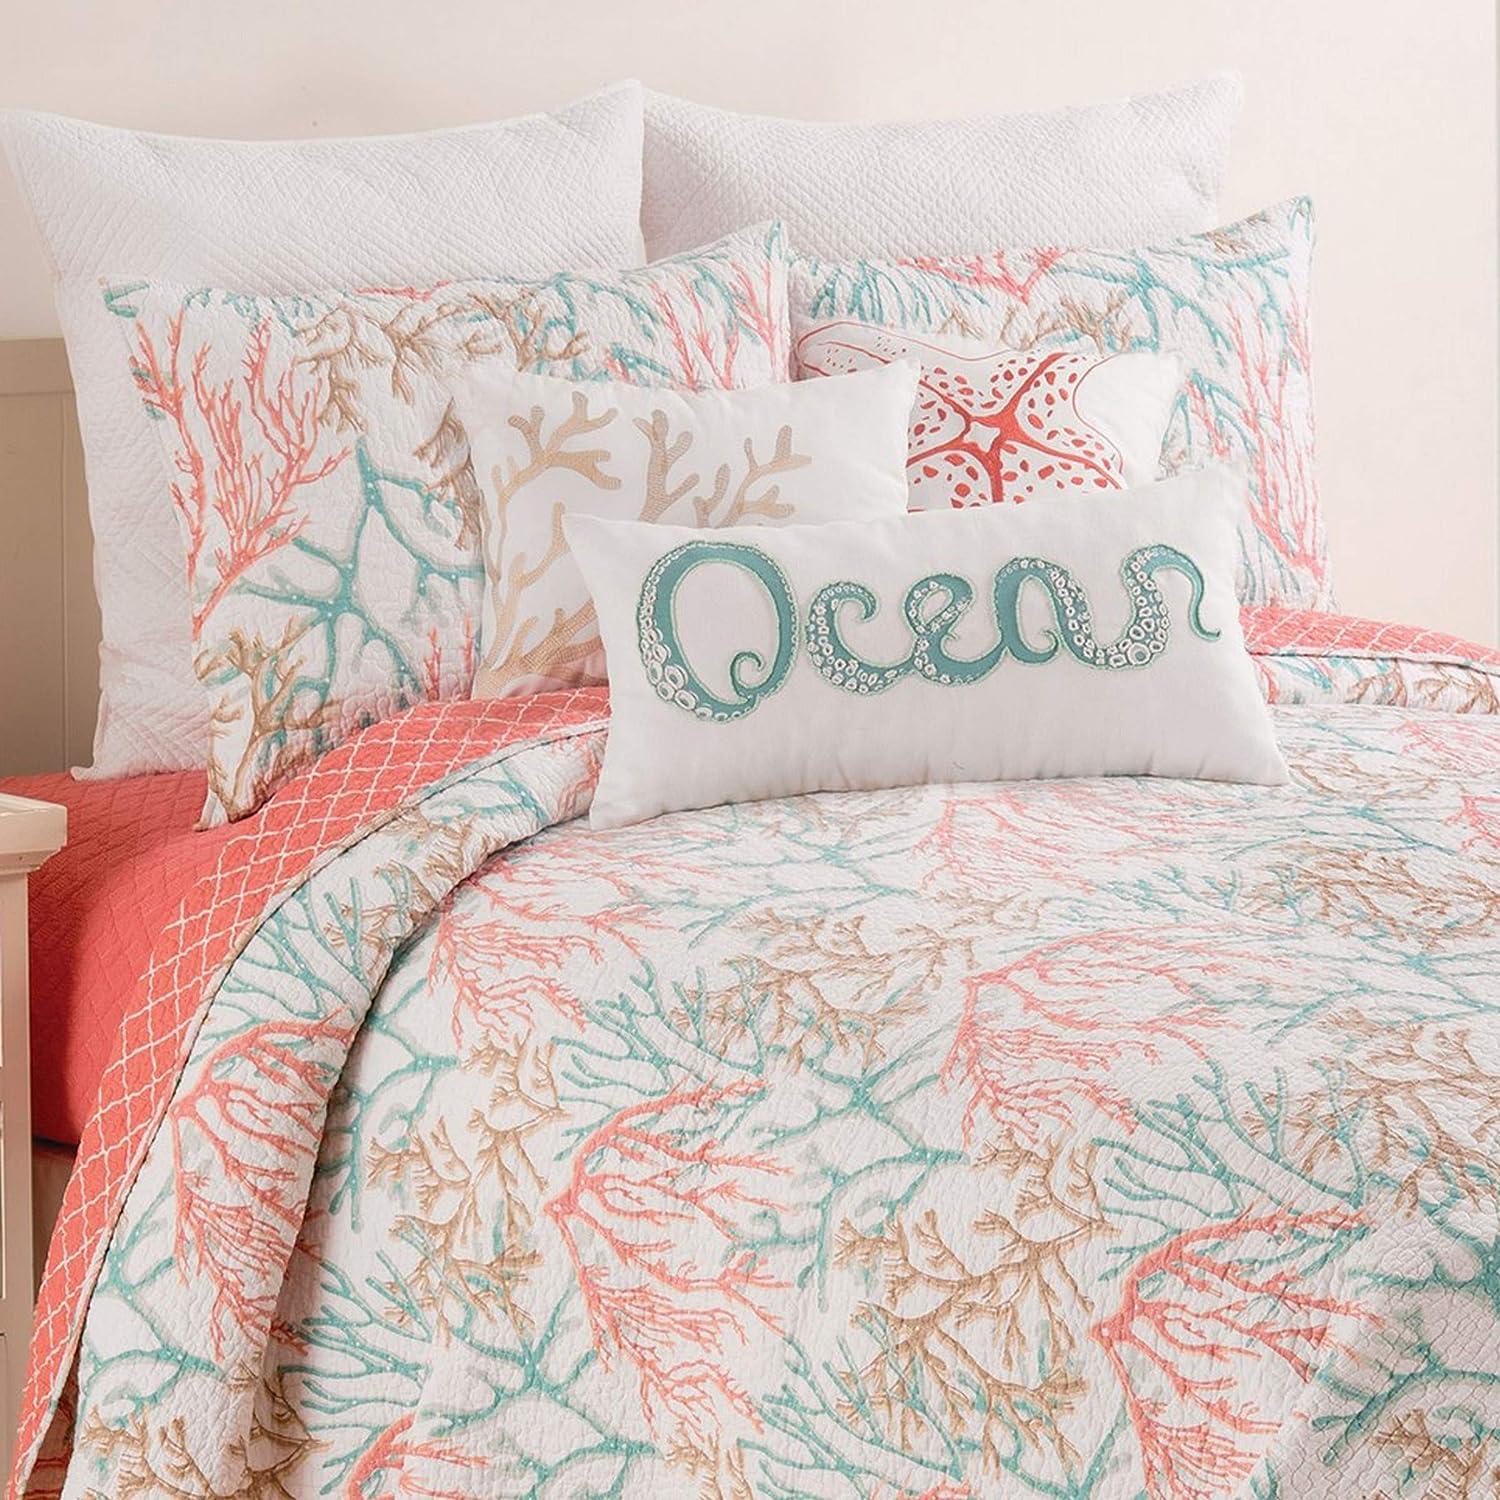 C&F Home Oceanaire Seafoam Full/Queen Quilt Set Oversized Cotton Beach Ocean Coastal Reef Bedspread Coverlet 3 Piece with 2 Shams